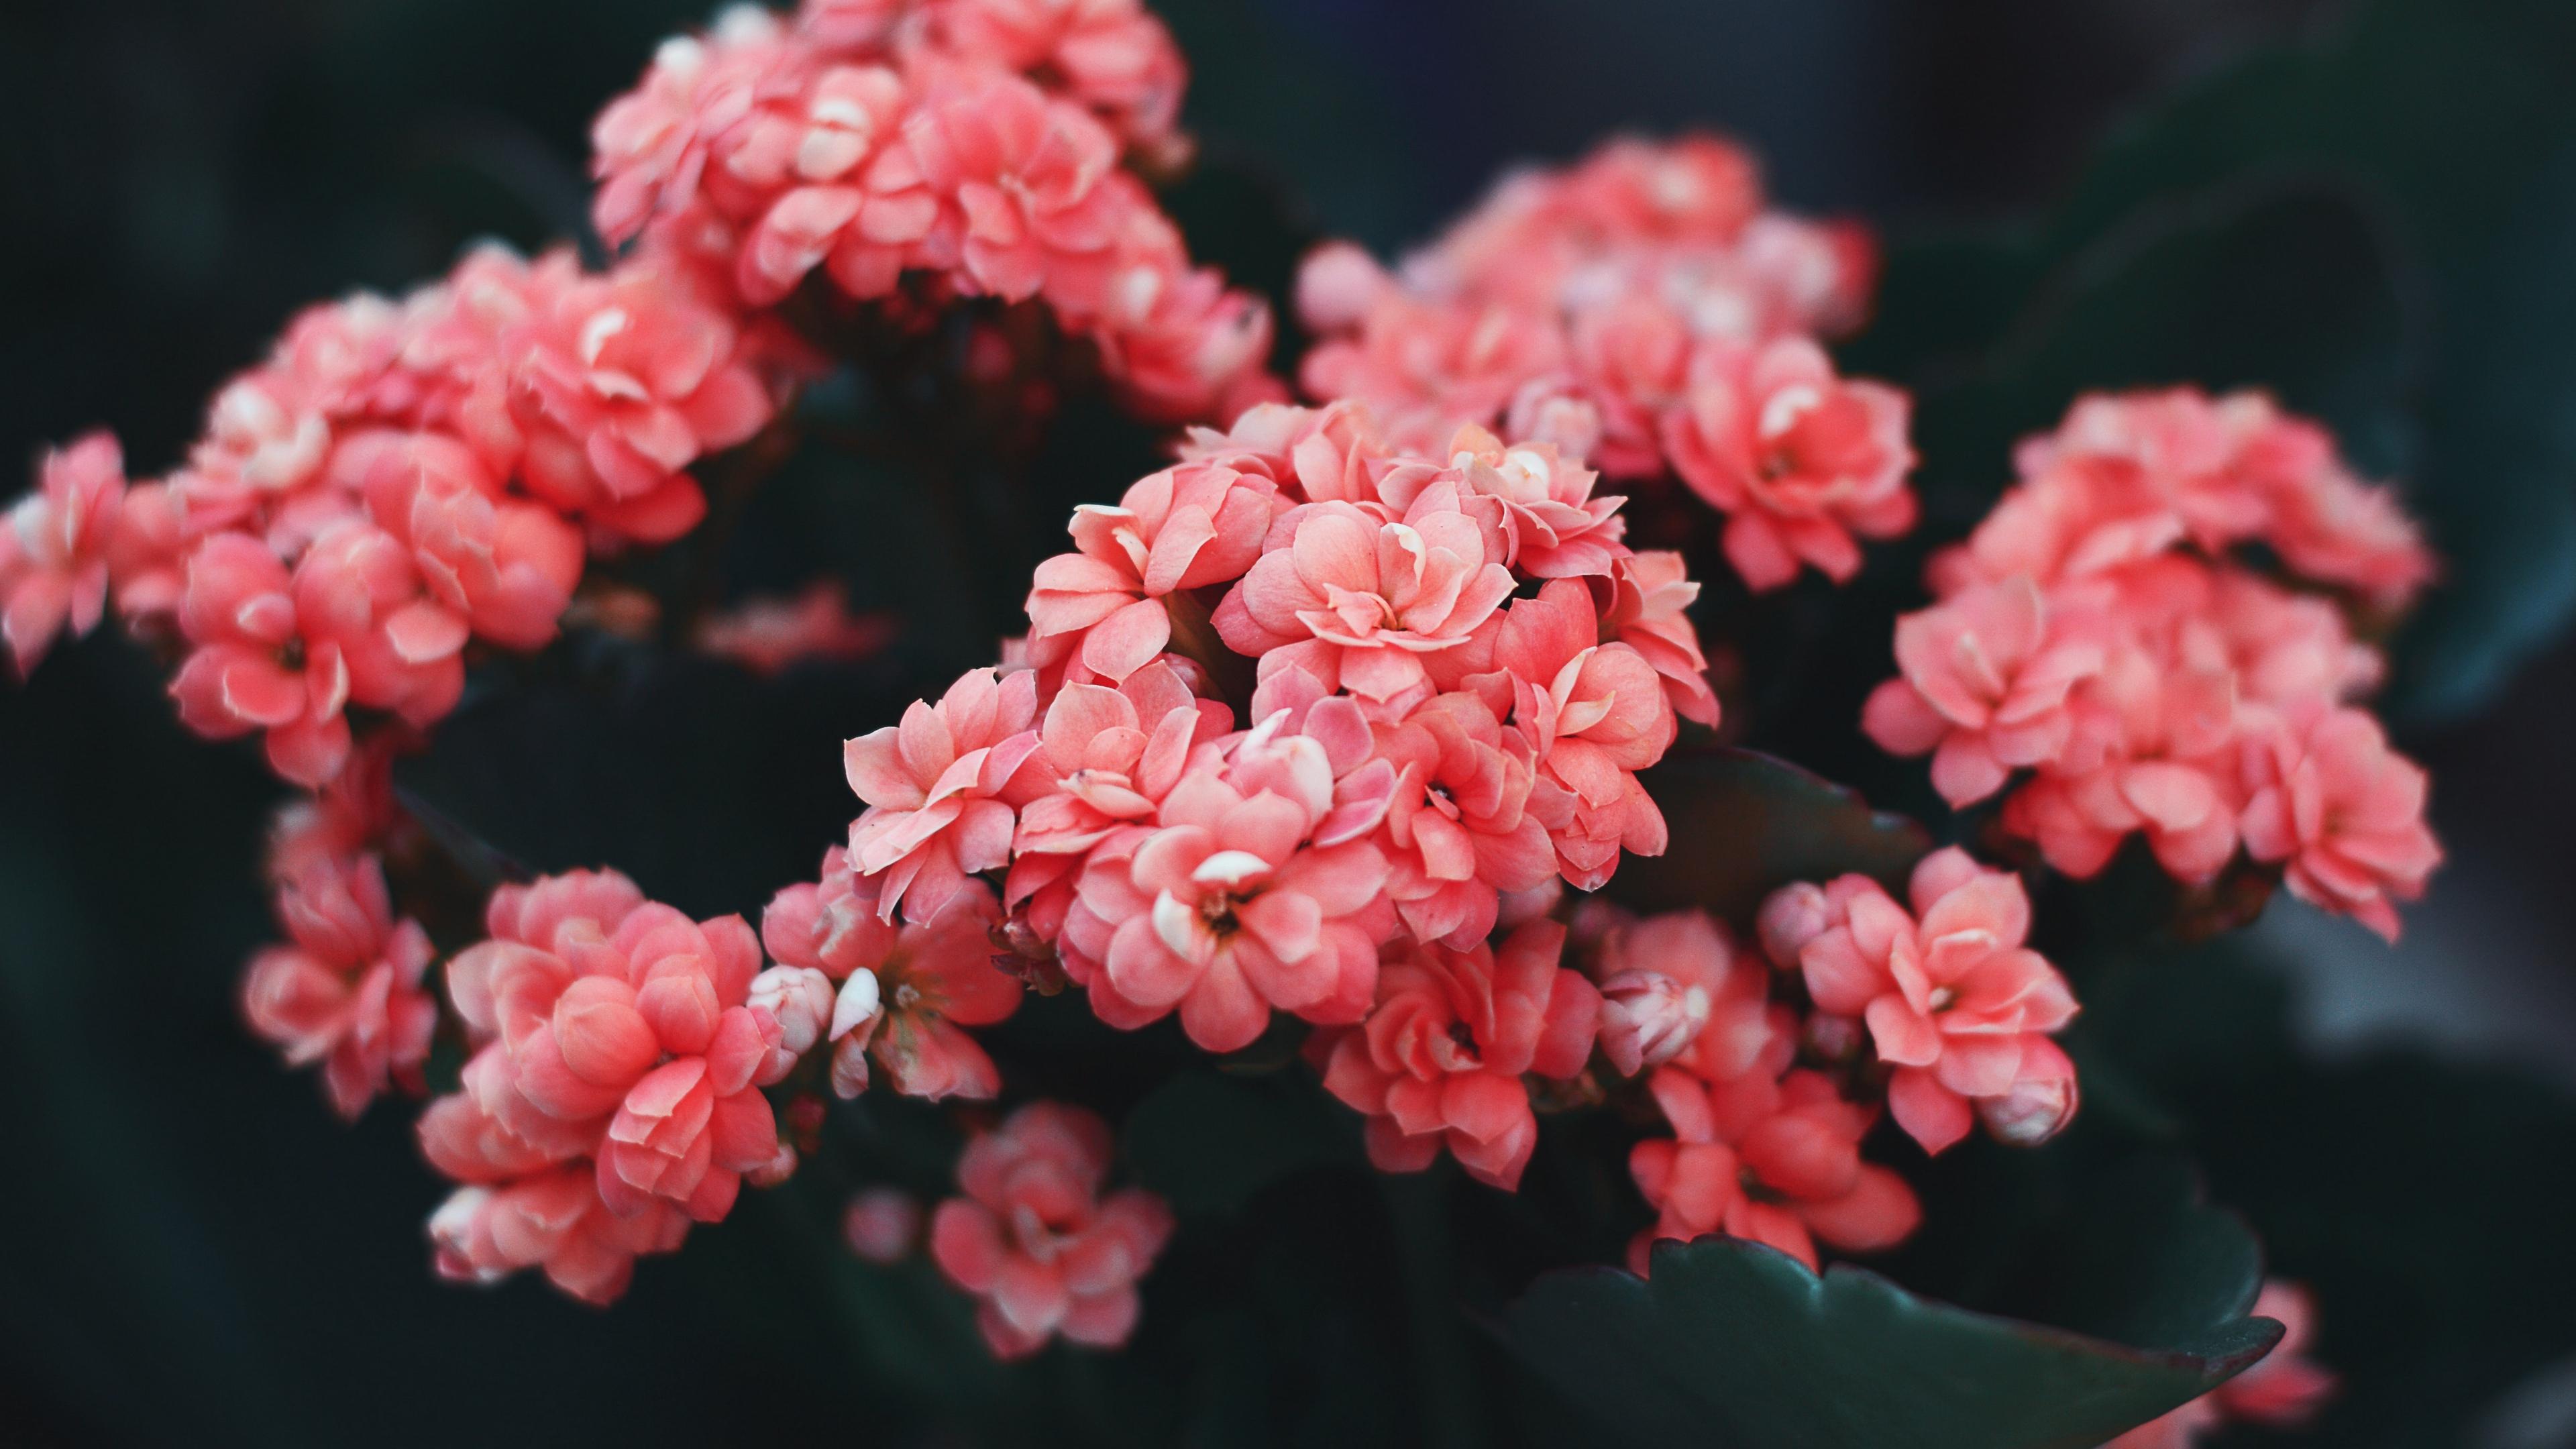 flowers pink bloom bush wild flower 4k 1540065147 - flowers, pink, bloom, bush, wild flower 4k - Pink, Flowers, Bloom